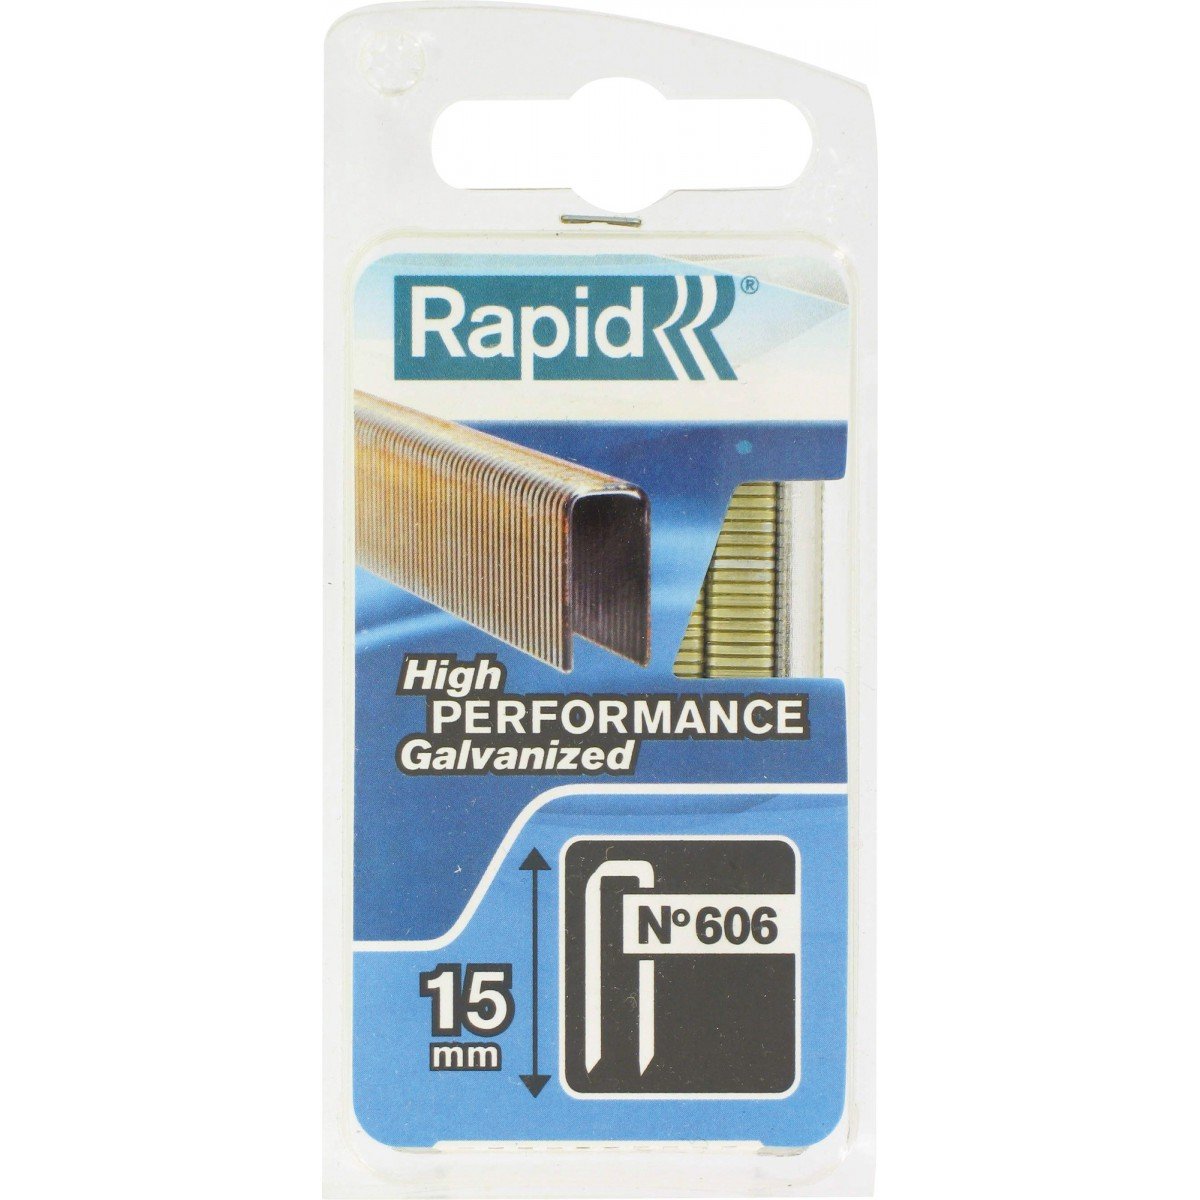 Agrafe n°606 Rapid Agraf - Hauteur 15 mm - 1200 agrafes